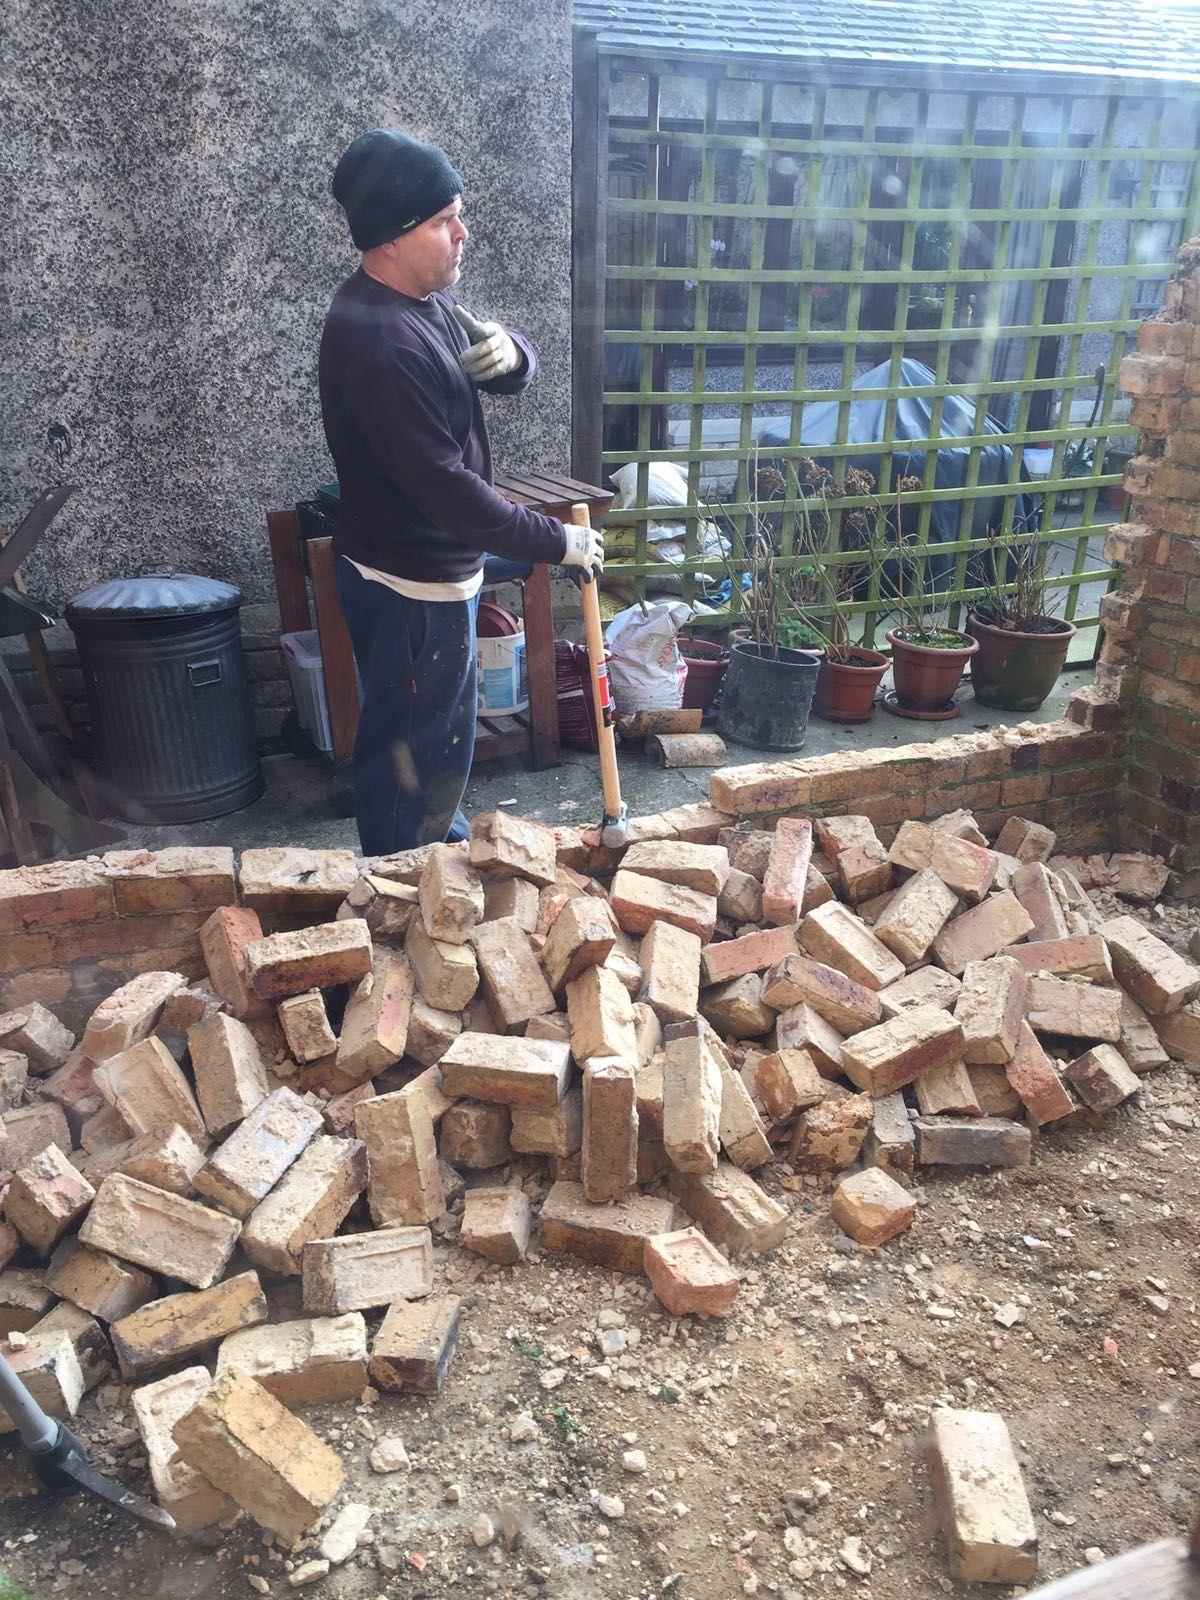 Day 1 starting! #victorianhouse #victorianhouserenovation #extension #singleatoreyextension #kitchendinerproject #buildingproject